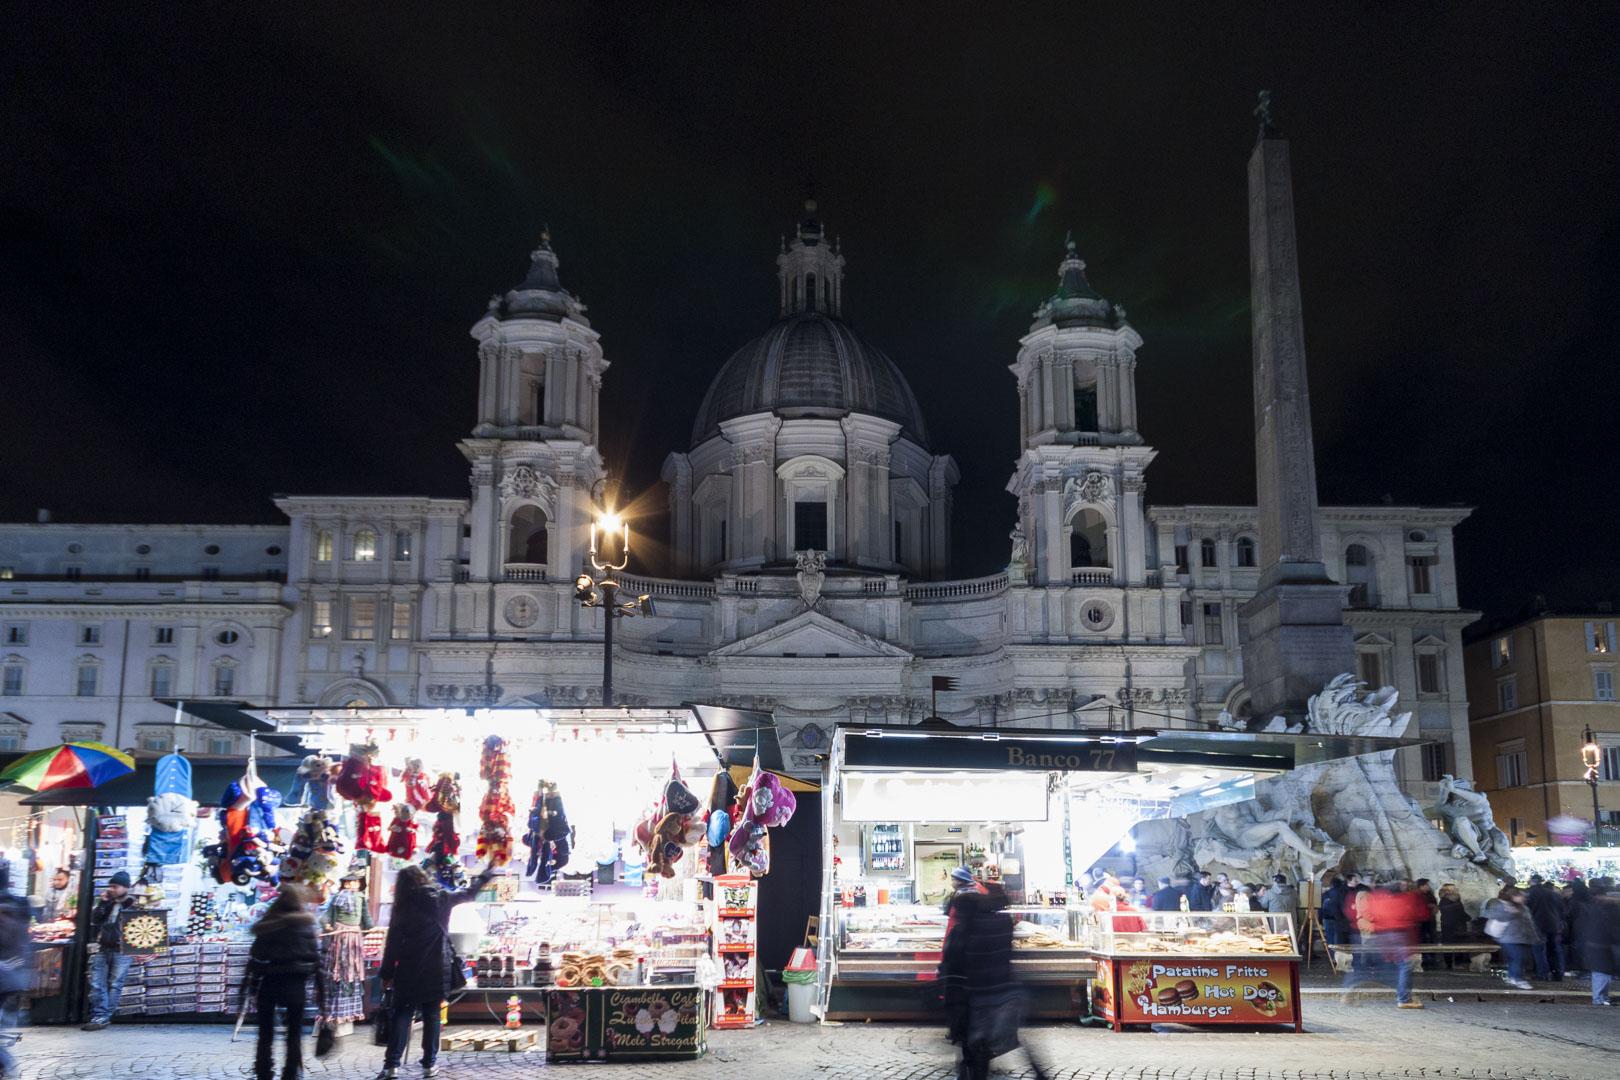 Piazza Navona, Rome – Italy